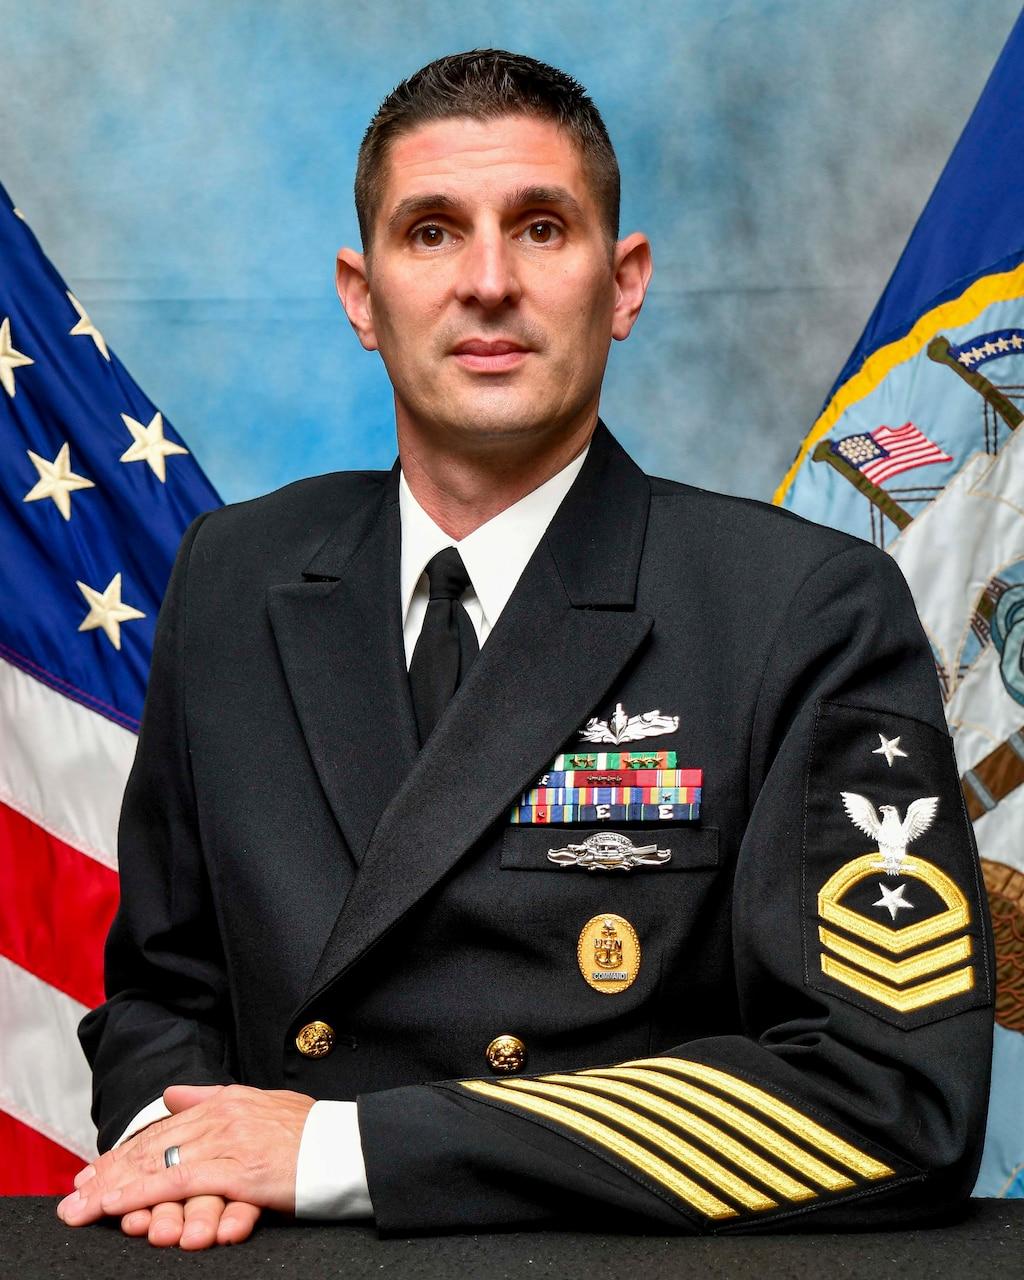 Command Senior Chief Blake R. Wohl